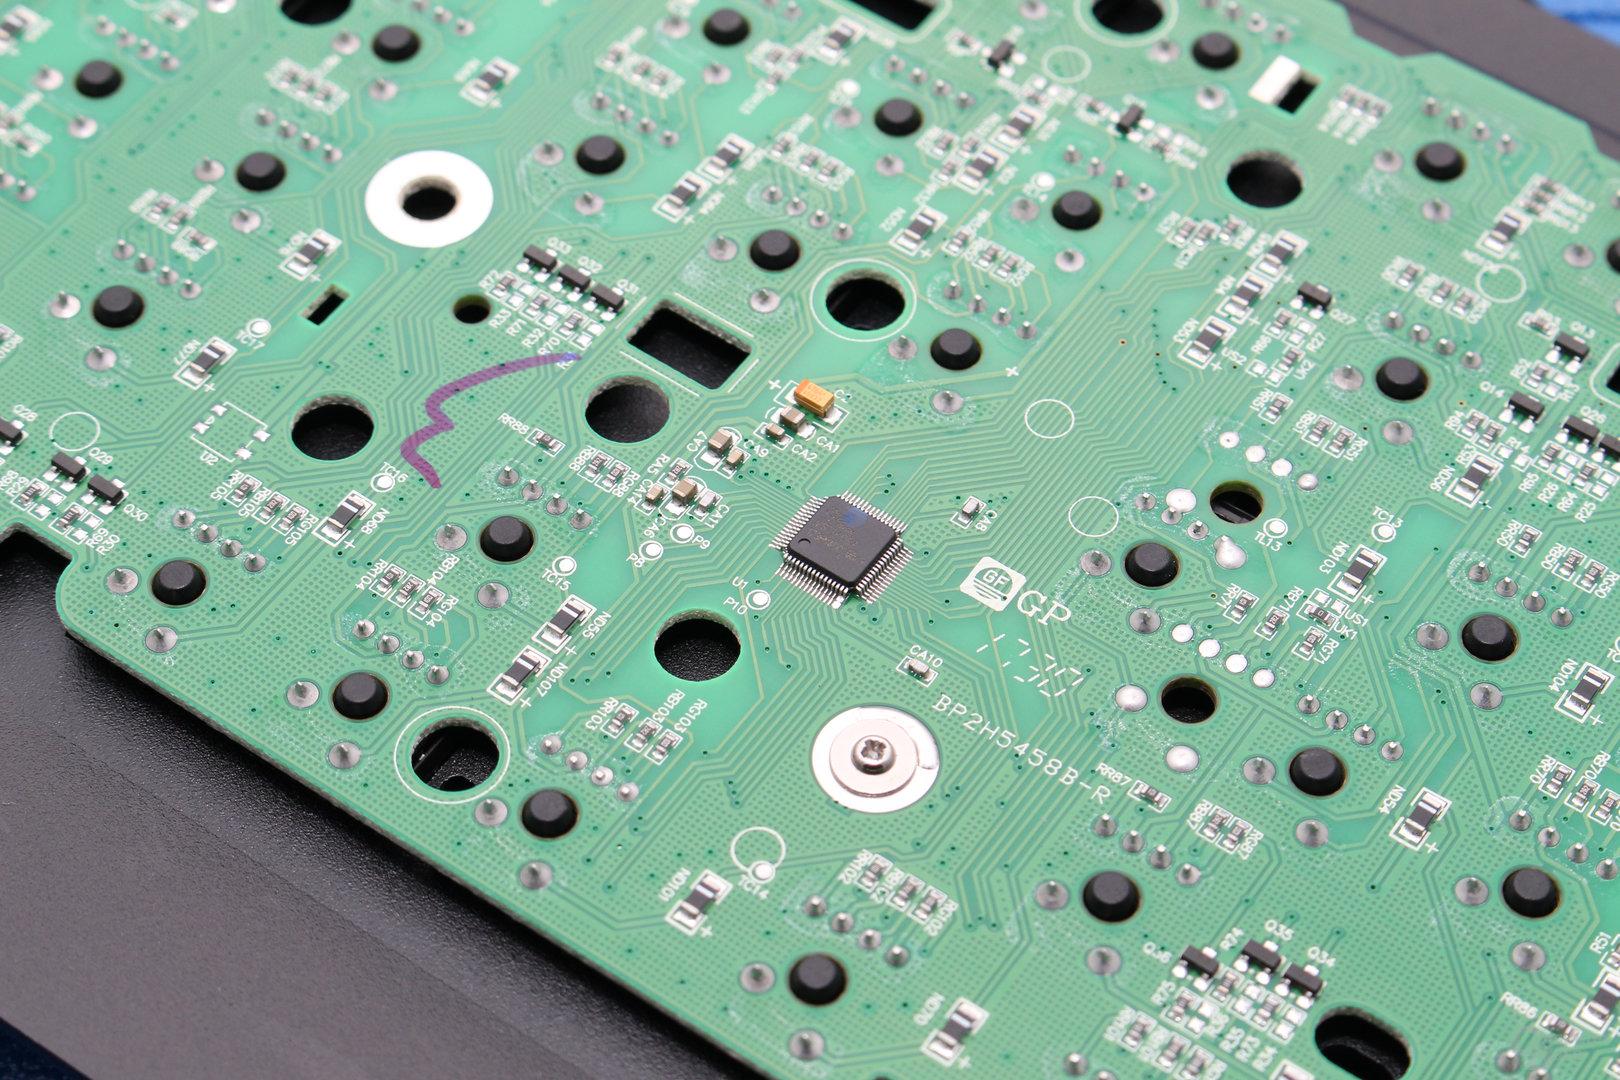 Der Mikrocontroller stammt von Vision (VS11K09A)